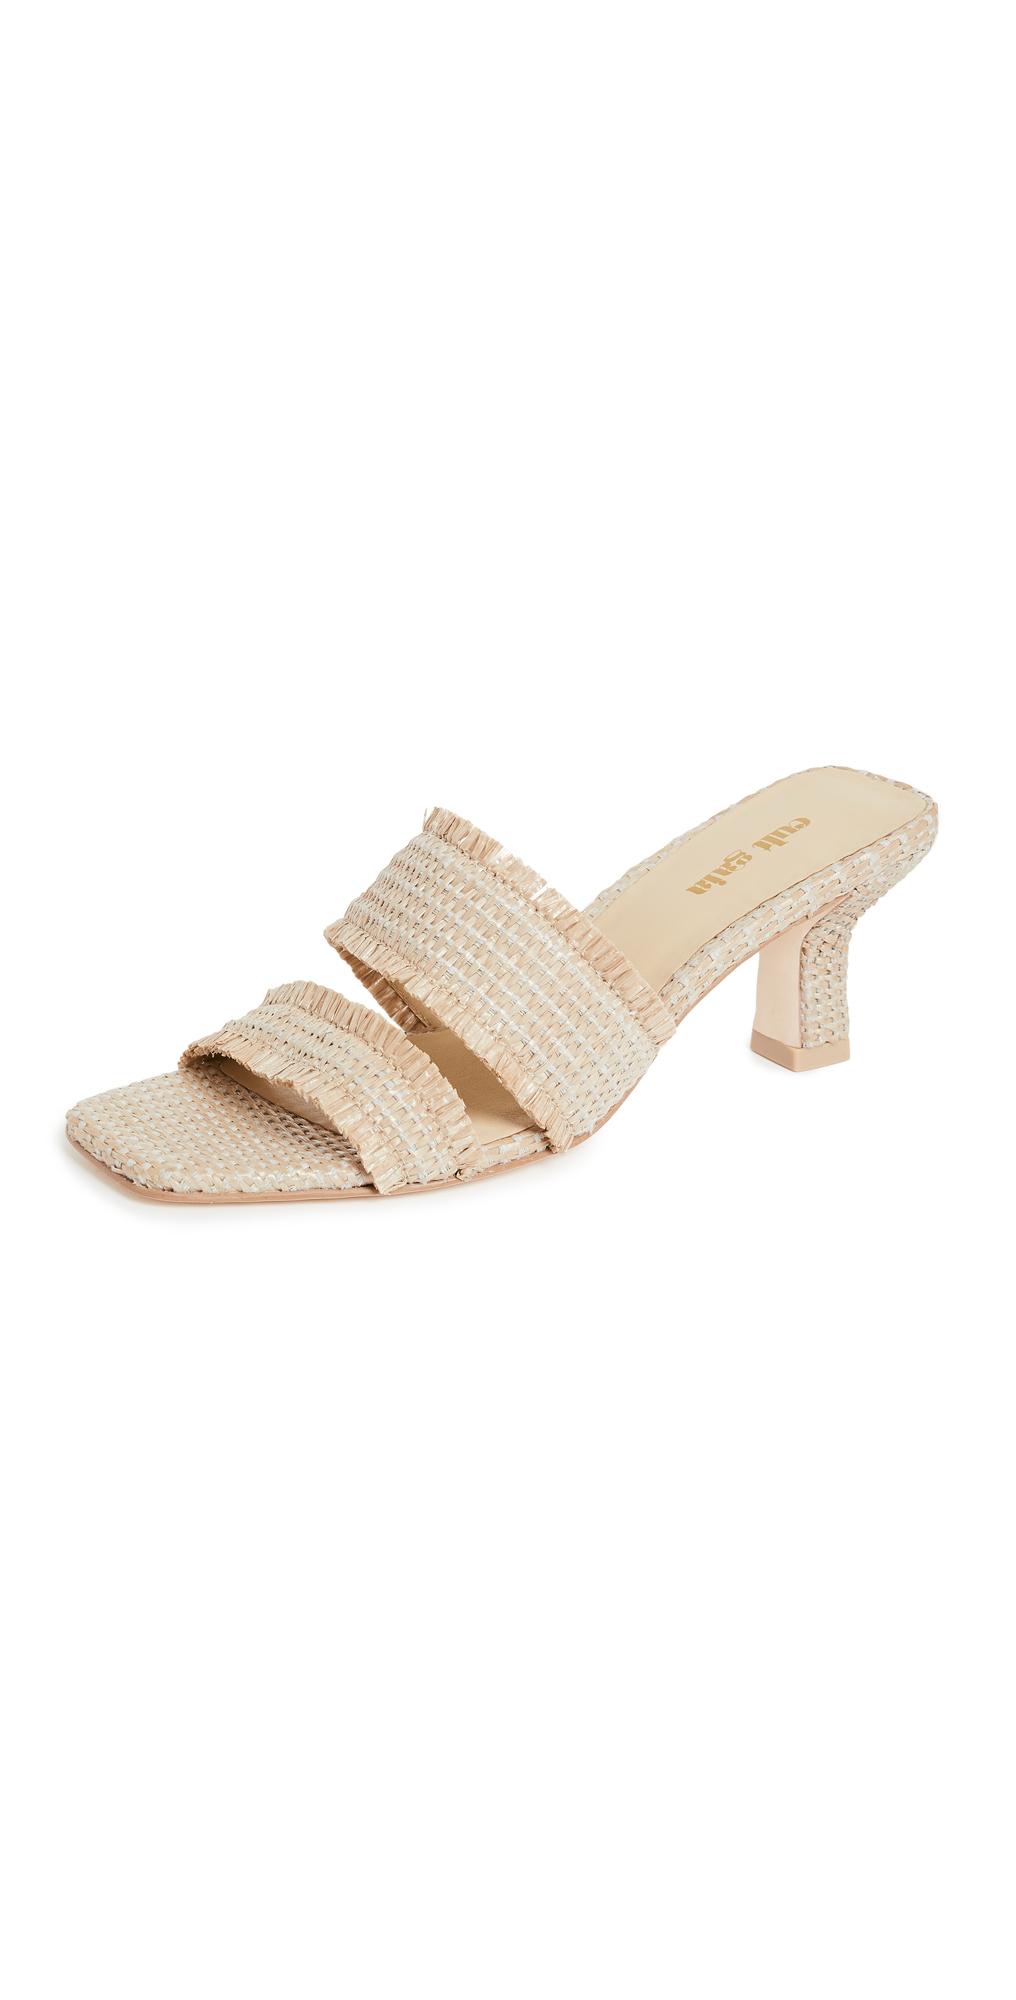 Cult Gaia Fae Sandals